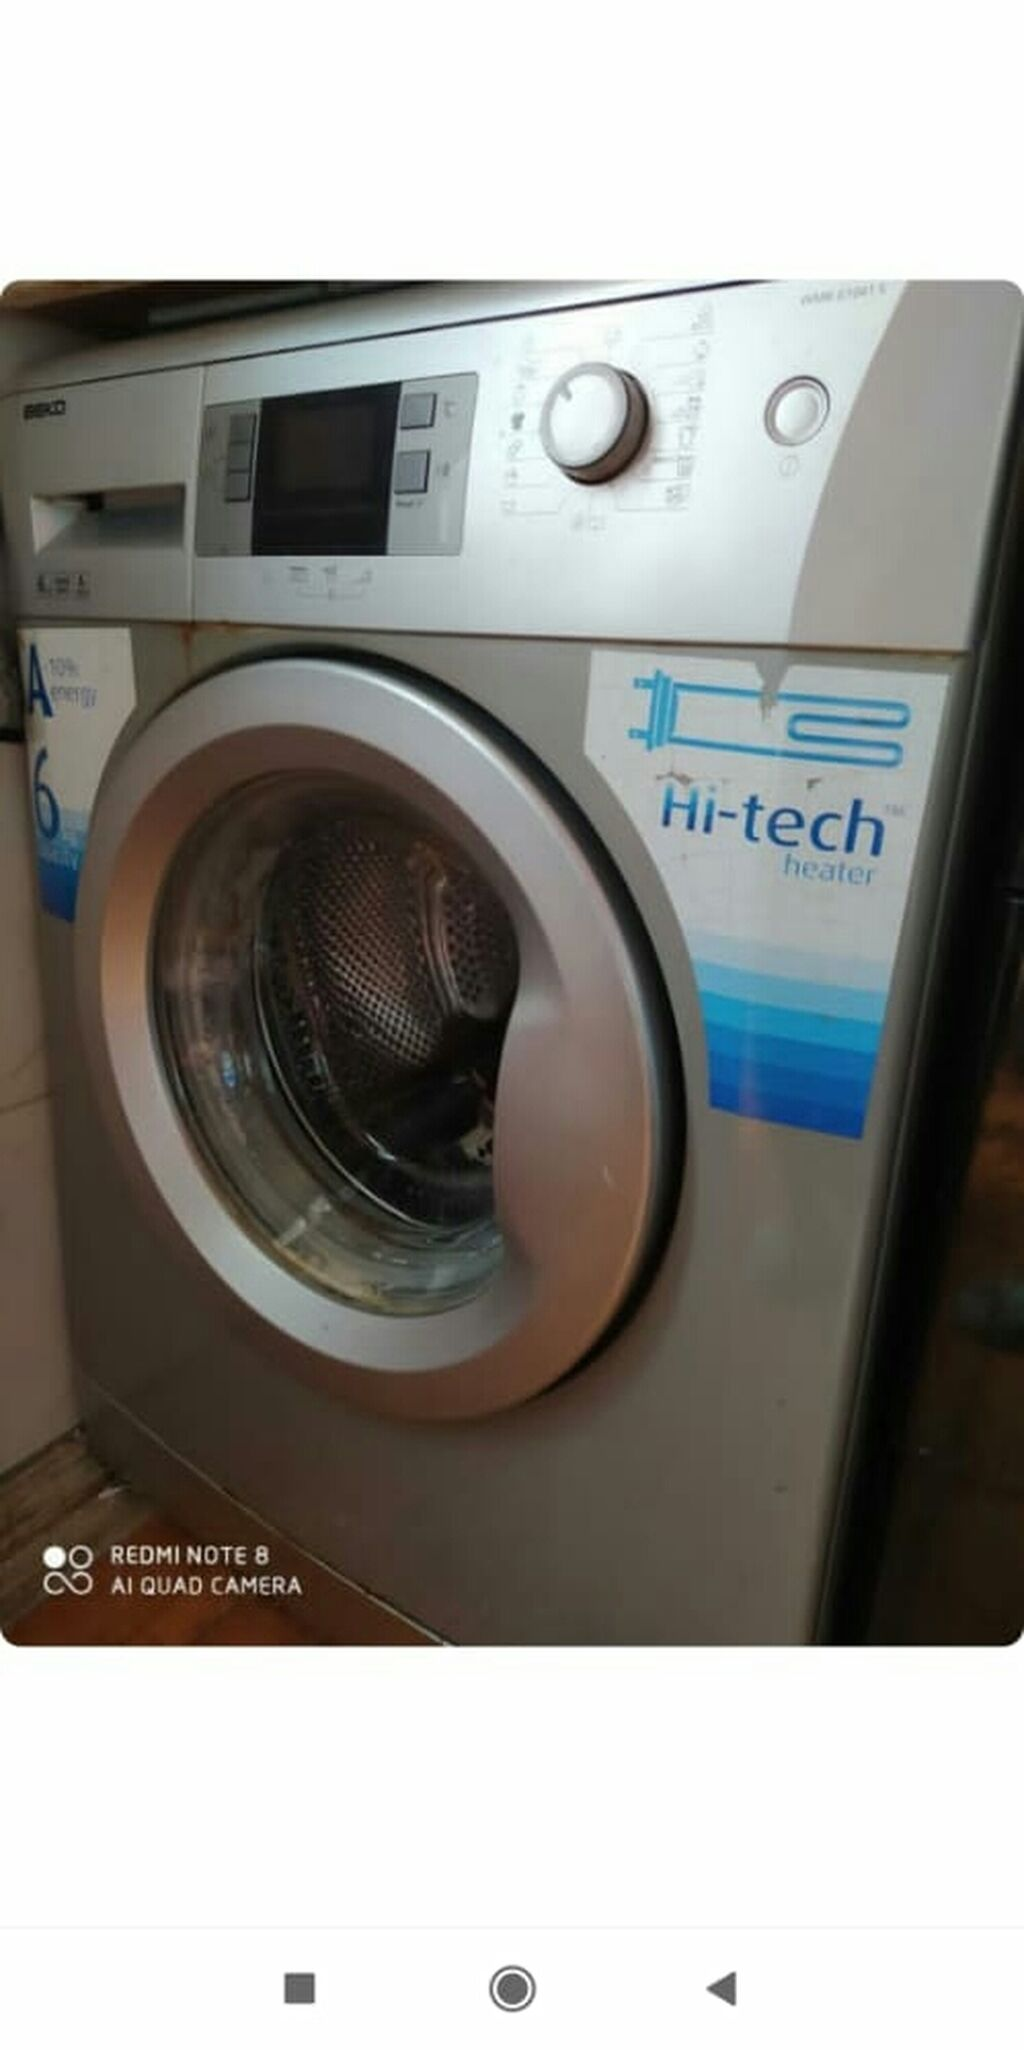 Avtomat Washing Machine: Avtomat Washing Machine